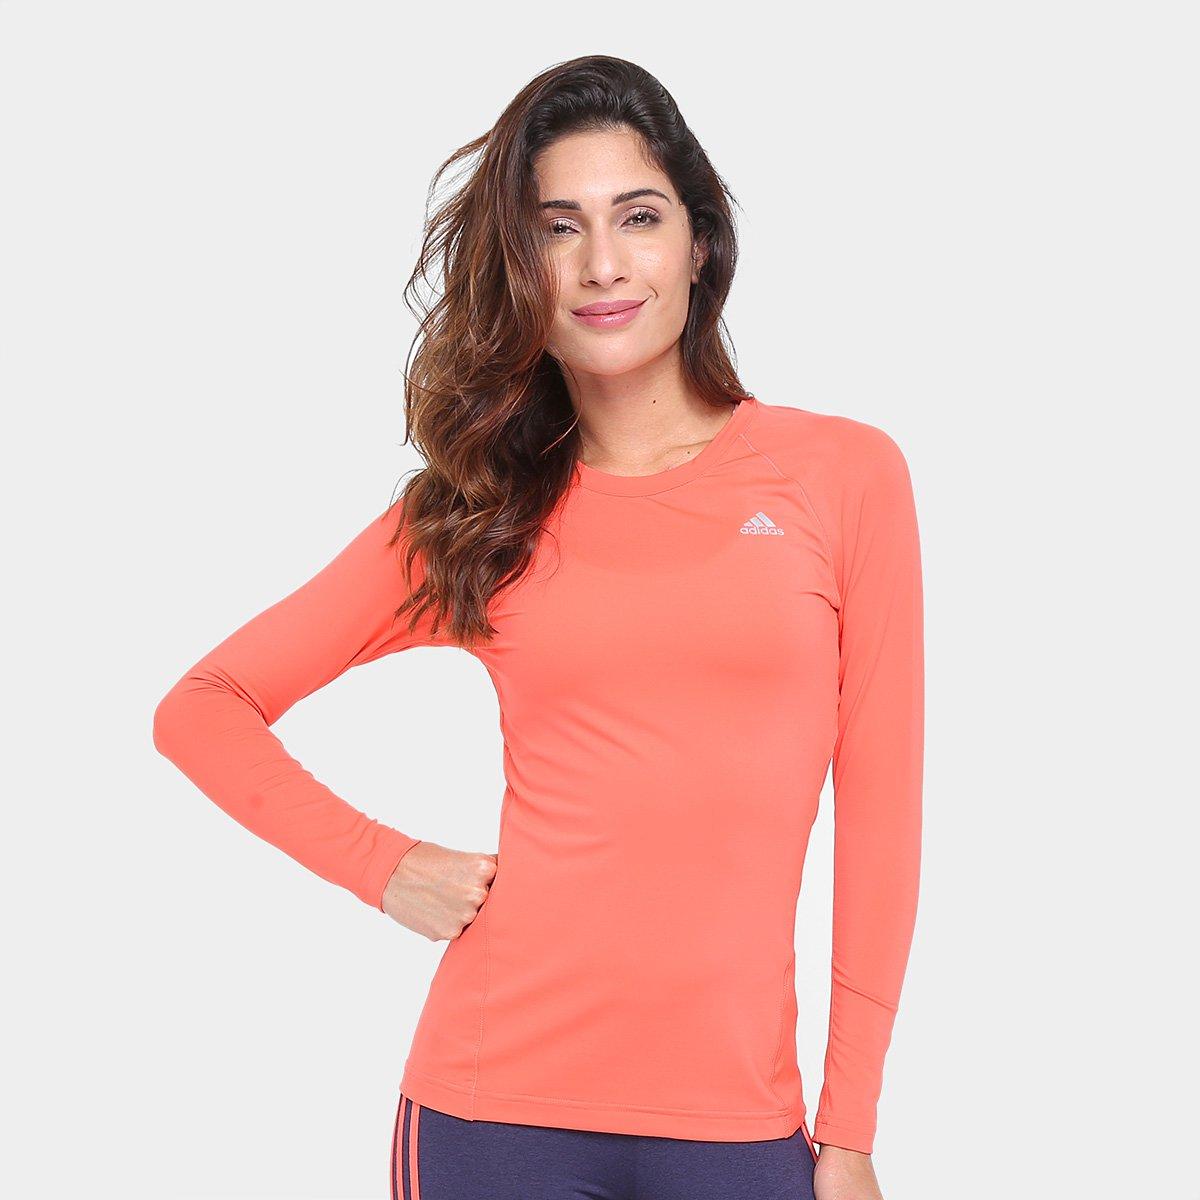 65013f7226 Camiseta Adidas Techfit Manga Longa Feminina - Compre Agora